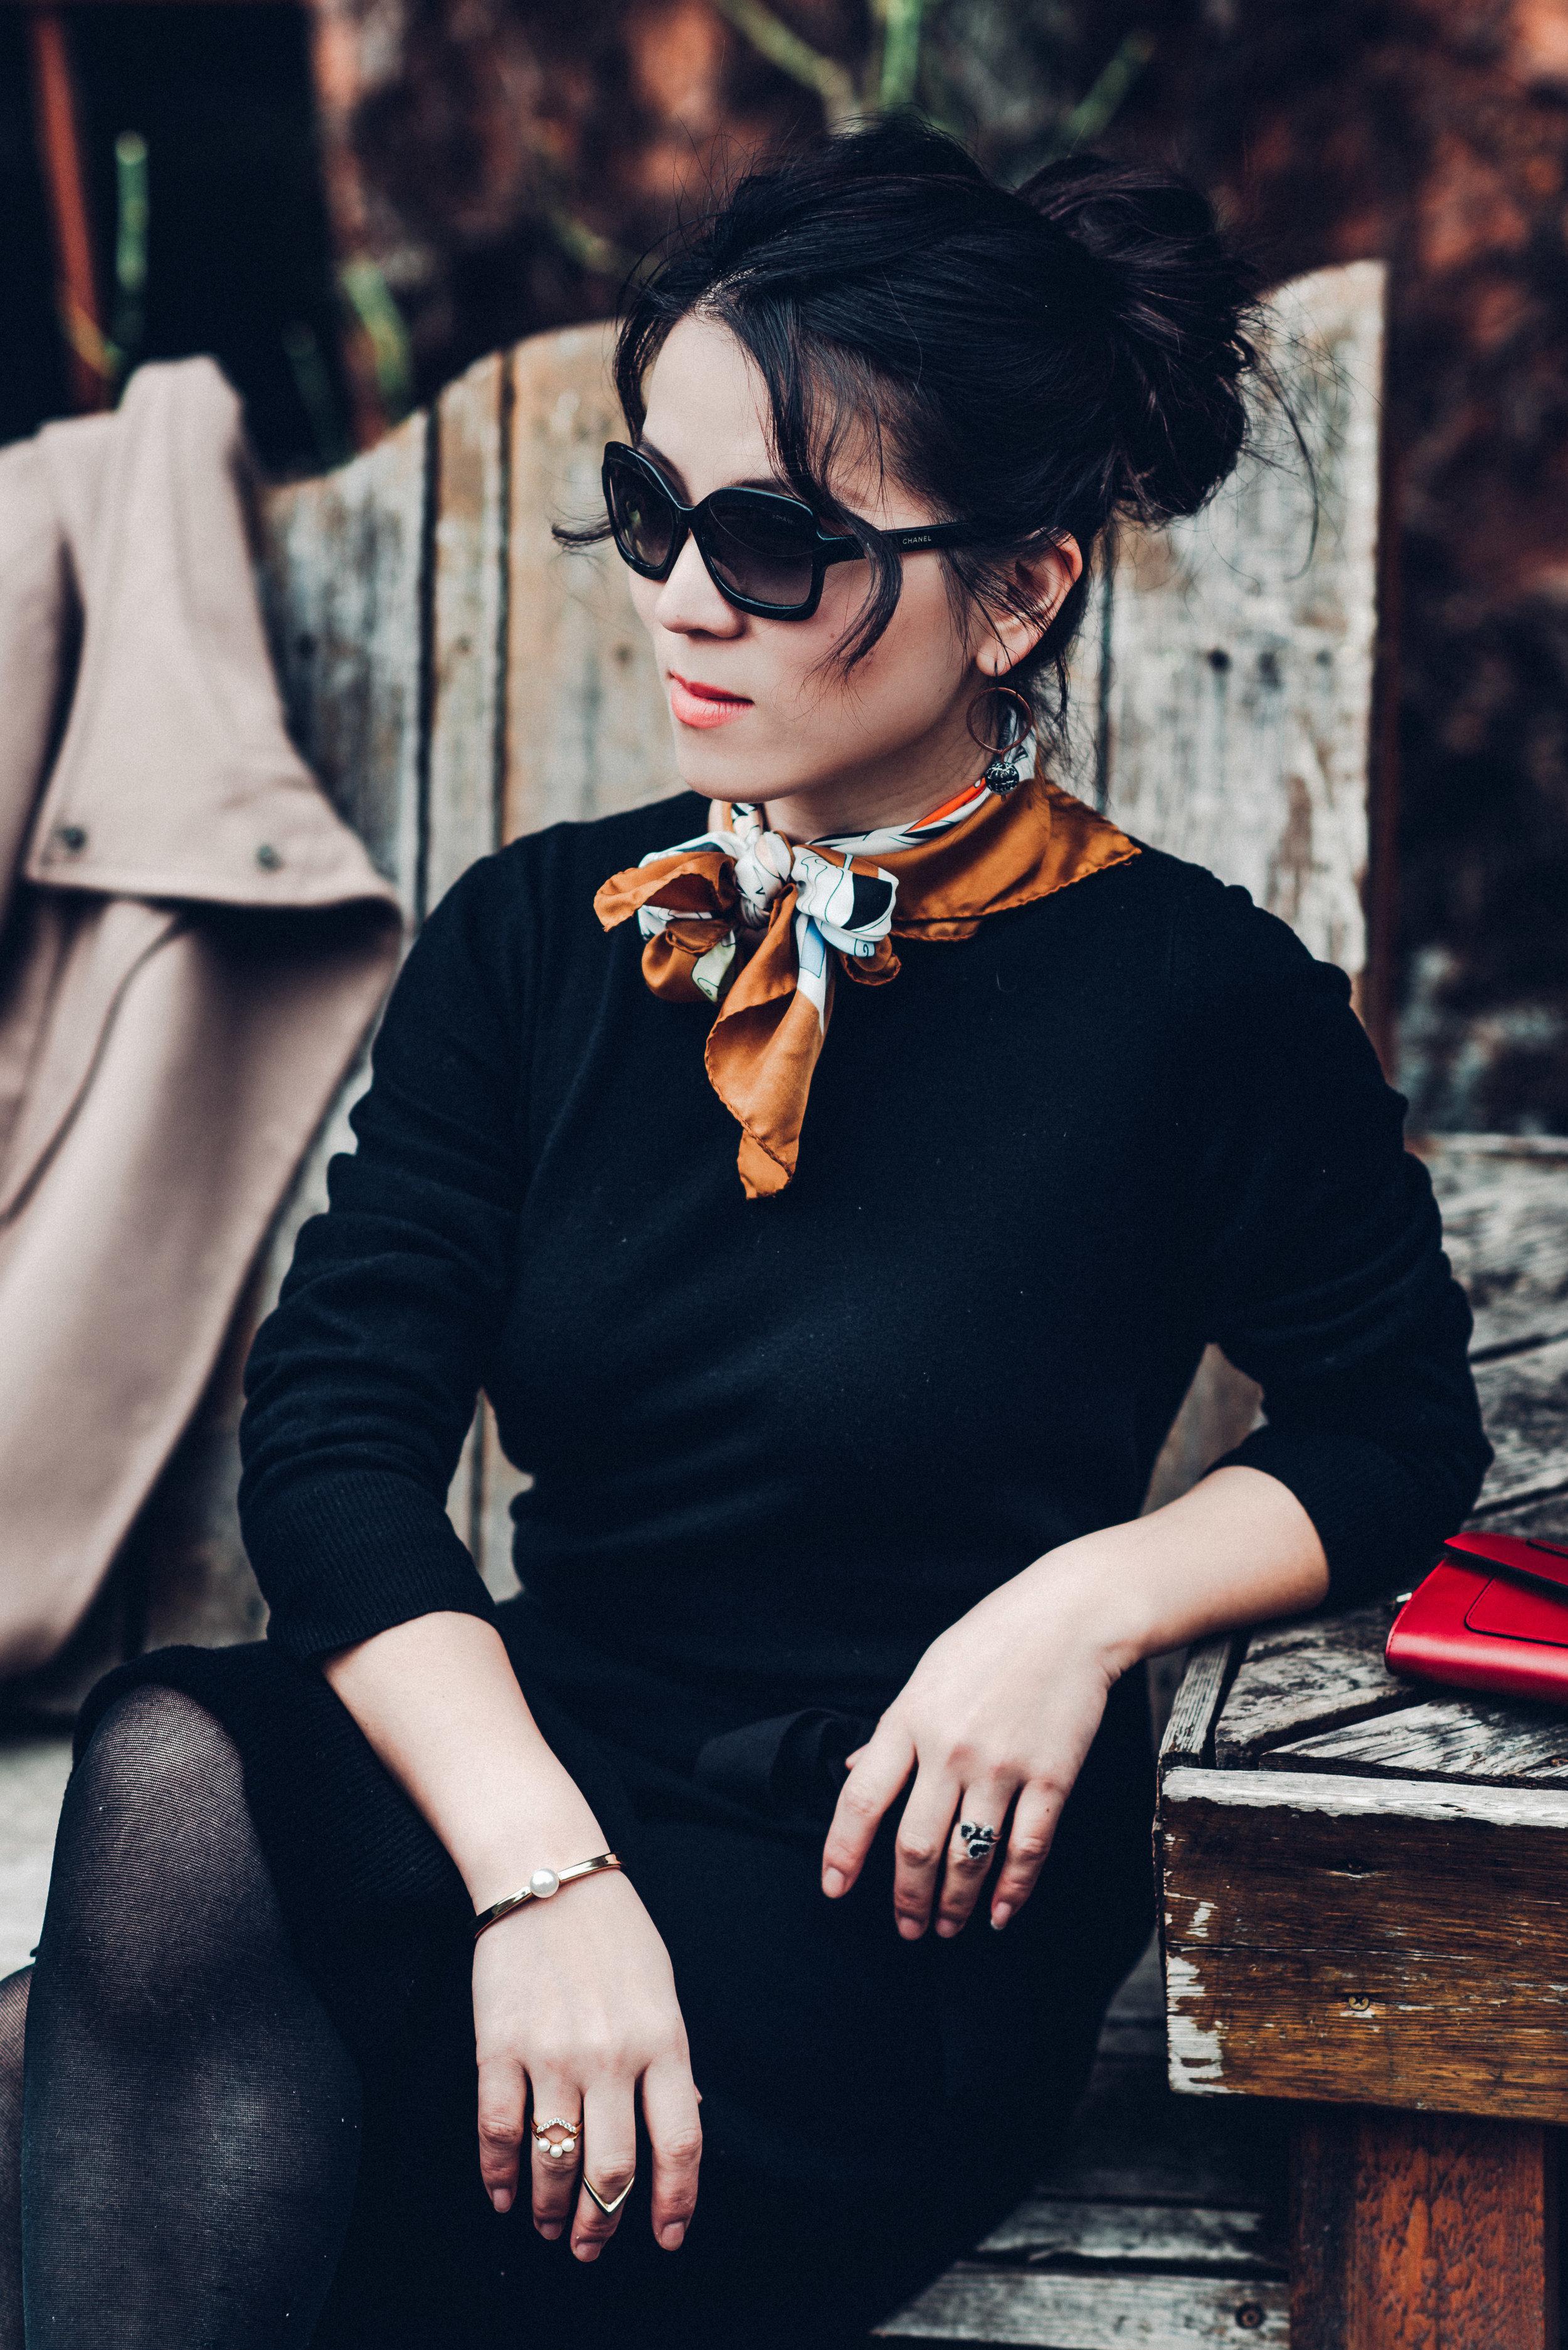 Black sandro sweater dress with scarf-8139